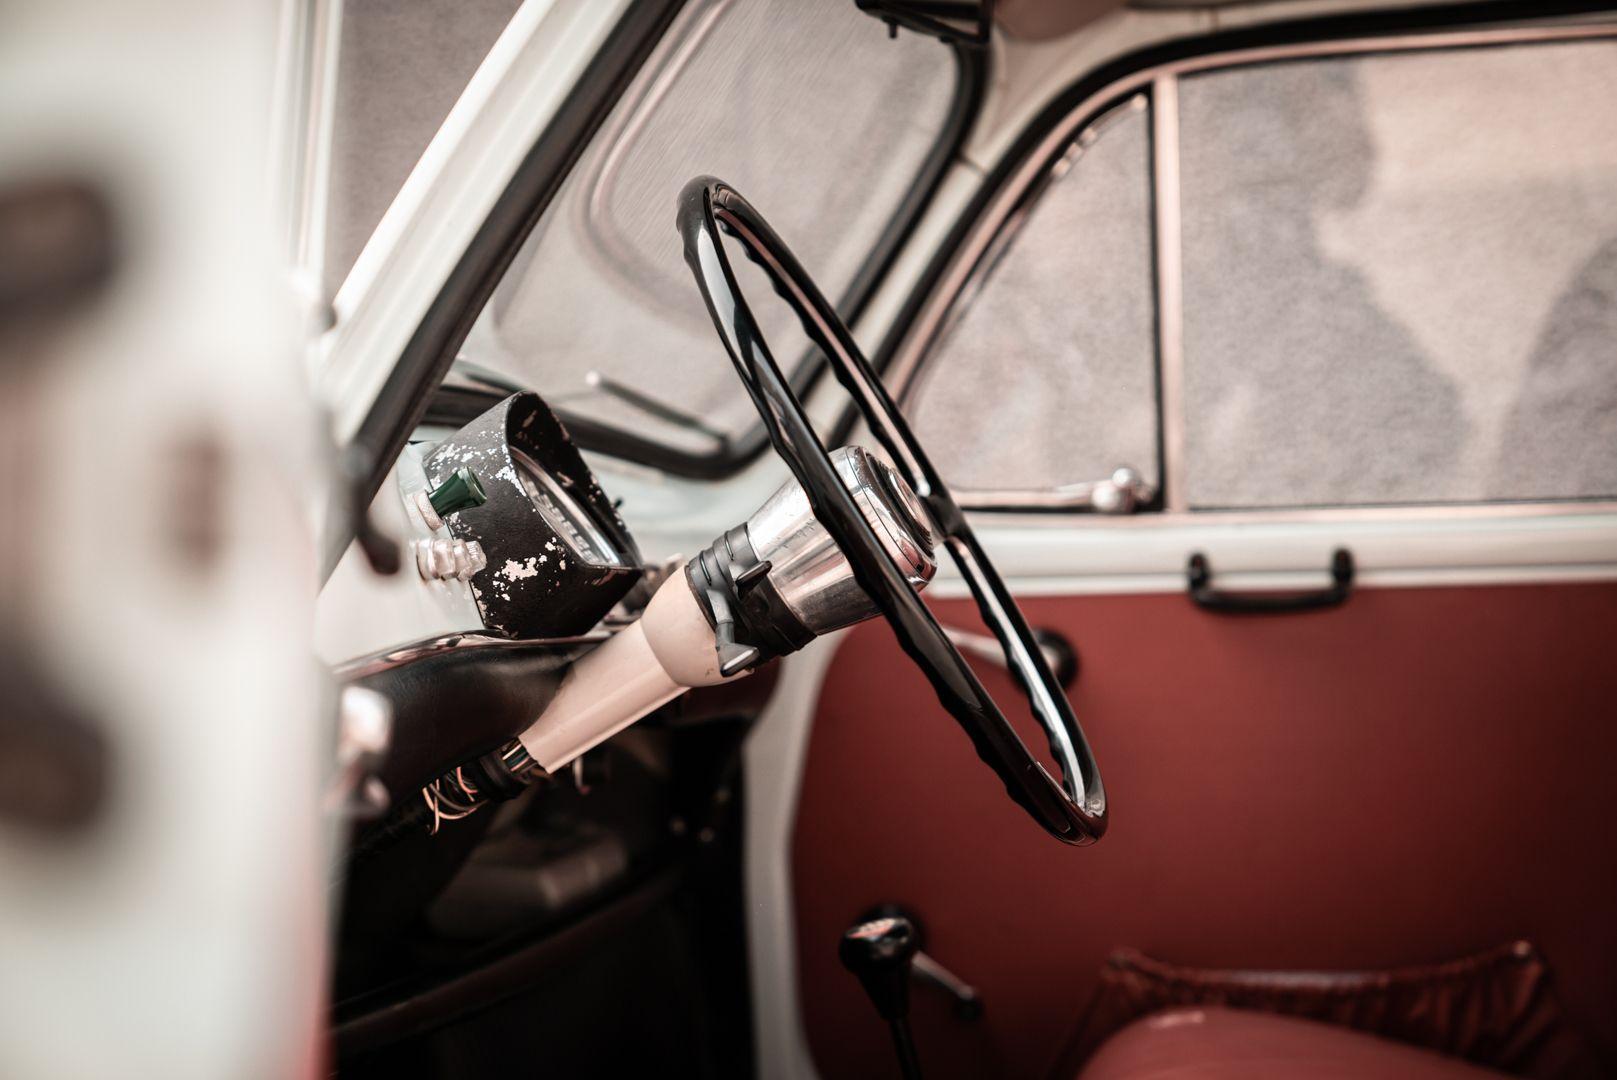 1968 Fiat Giannini 750 TV Turismo Veloce 77102